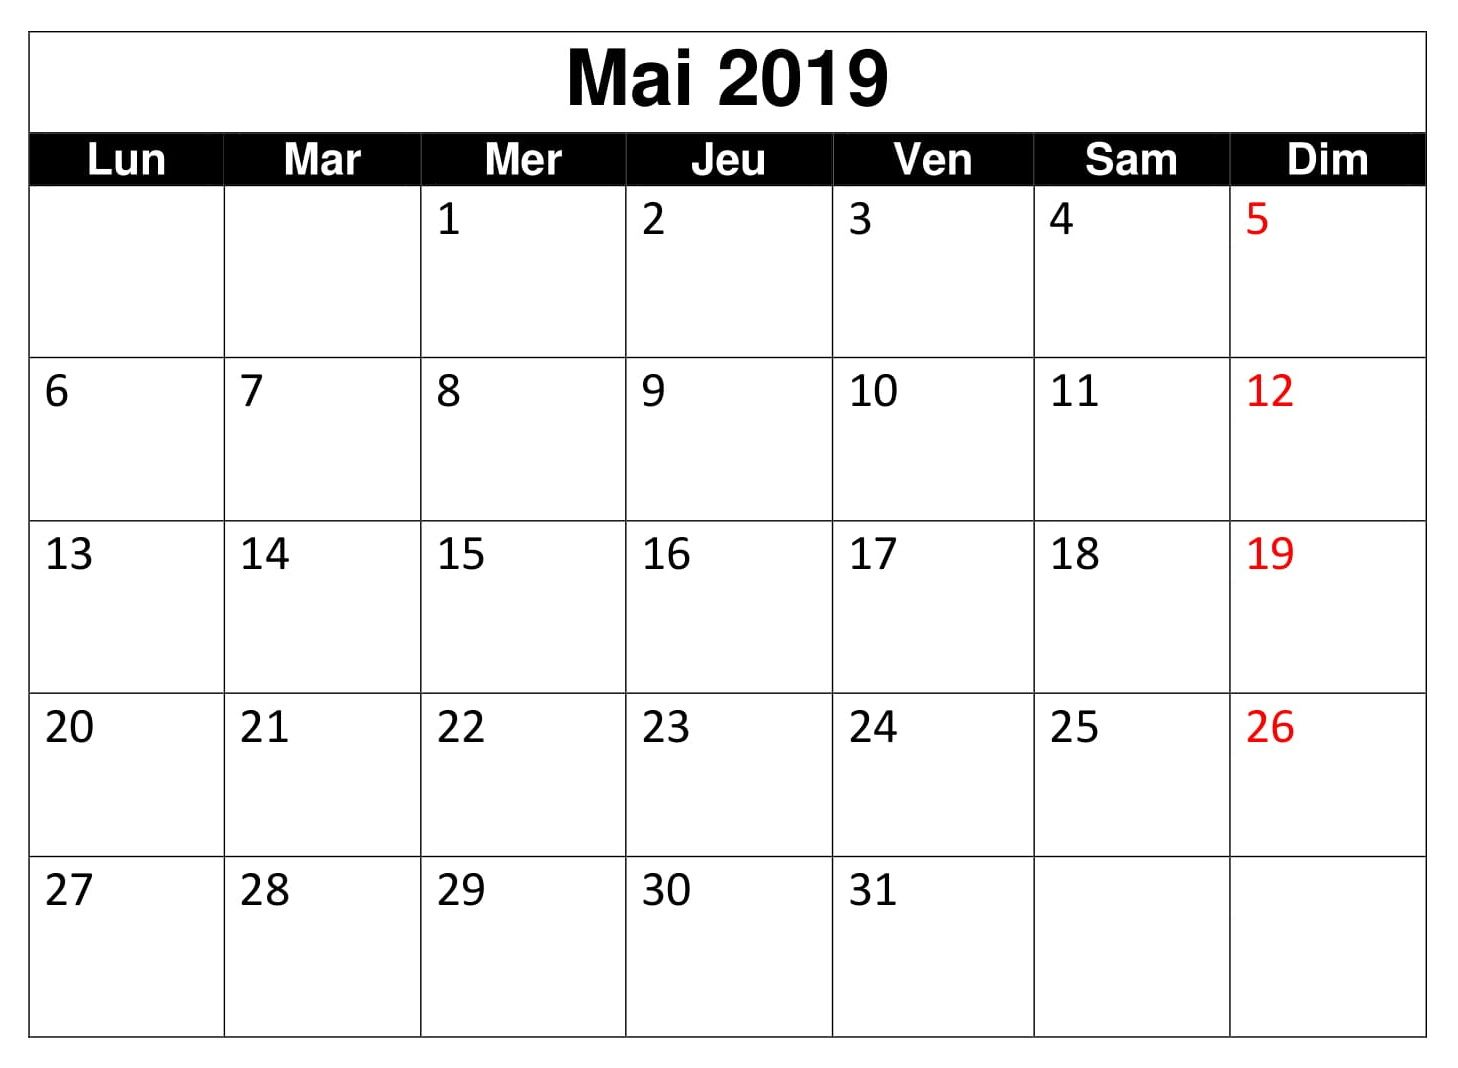 Template Calendrier 2019.Calendrier 2019 Editable Mai Blank Calendar Template 2019